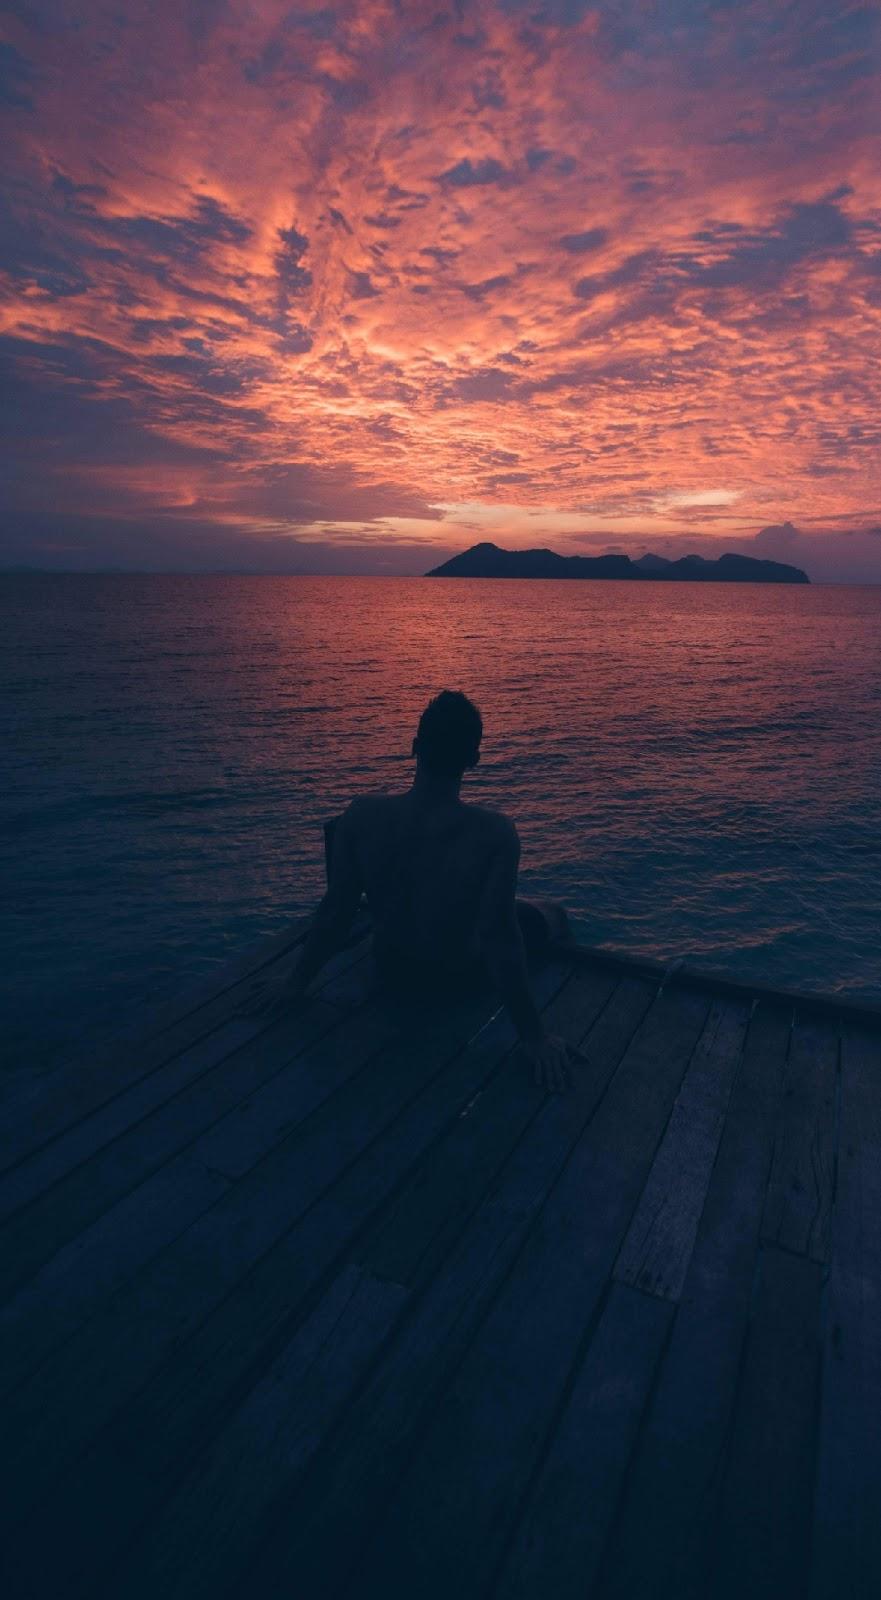 SAM WALLPAPERS: Alone Boy Mobile HD Wallpaper